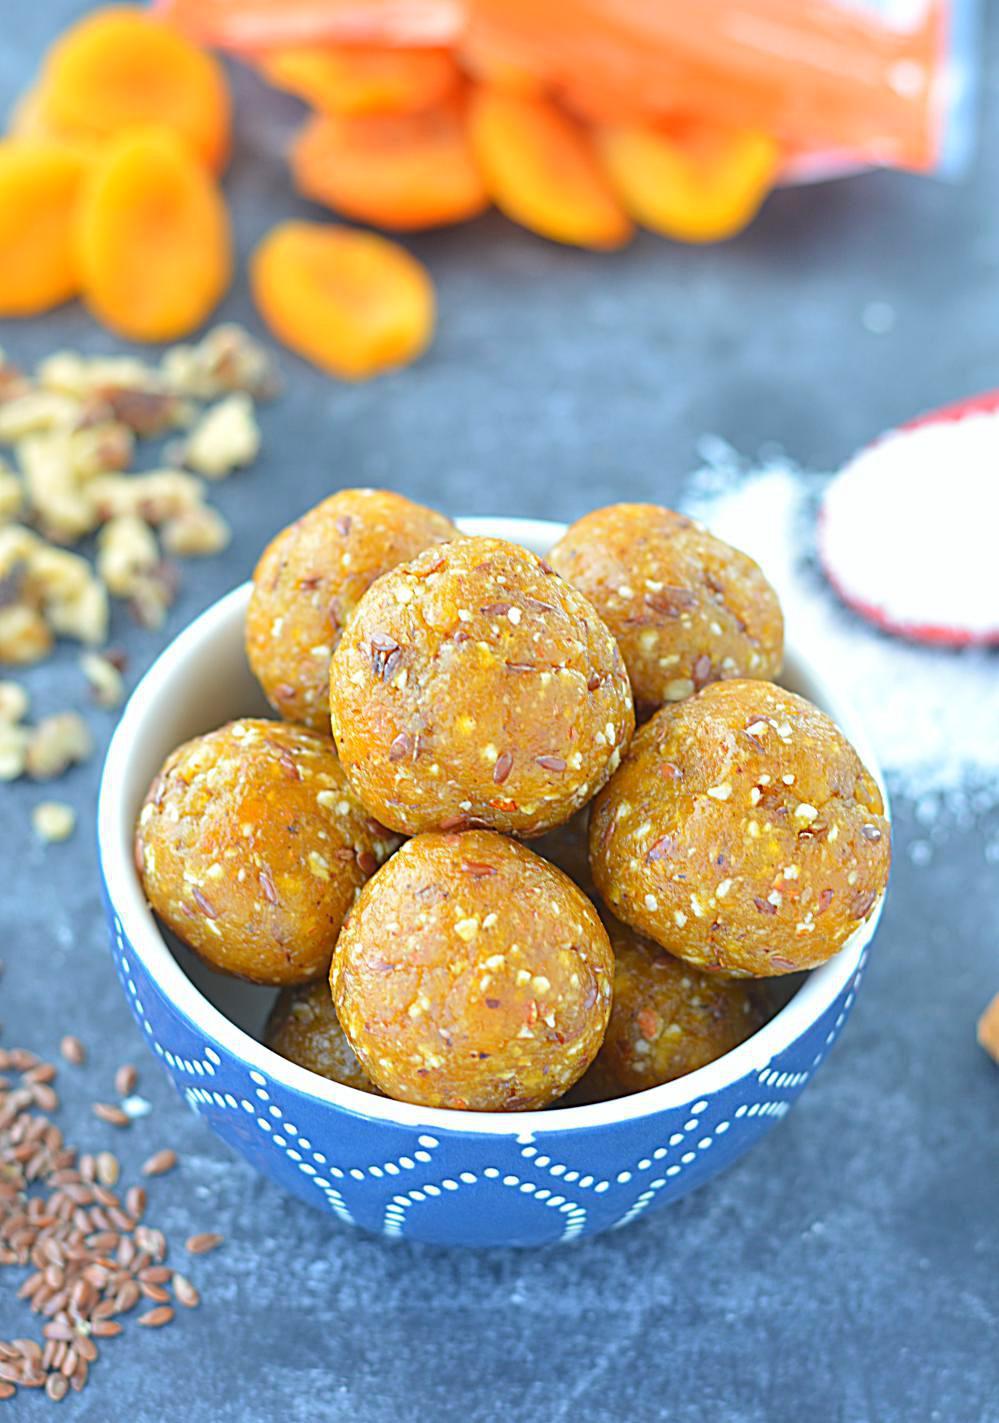 Healthy Apricot Recipes  No Cook Apricot Energy Bites healthy no bake energy bites